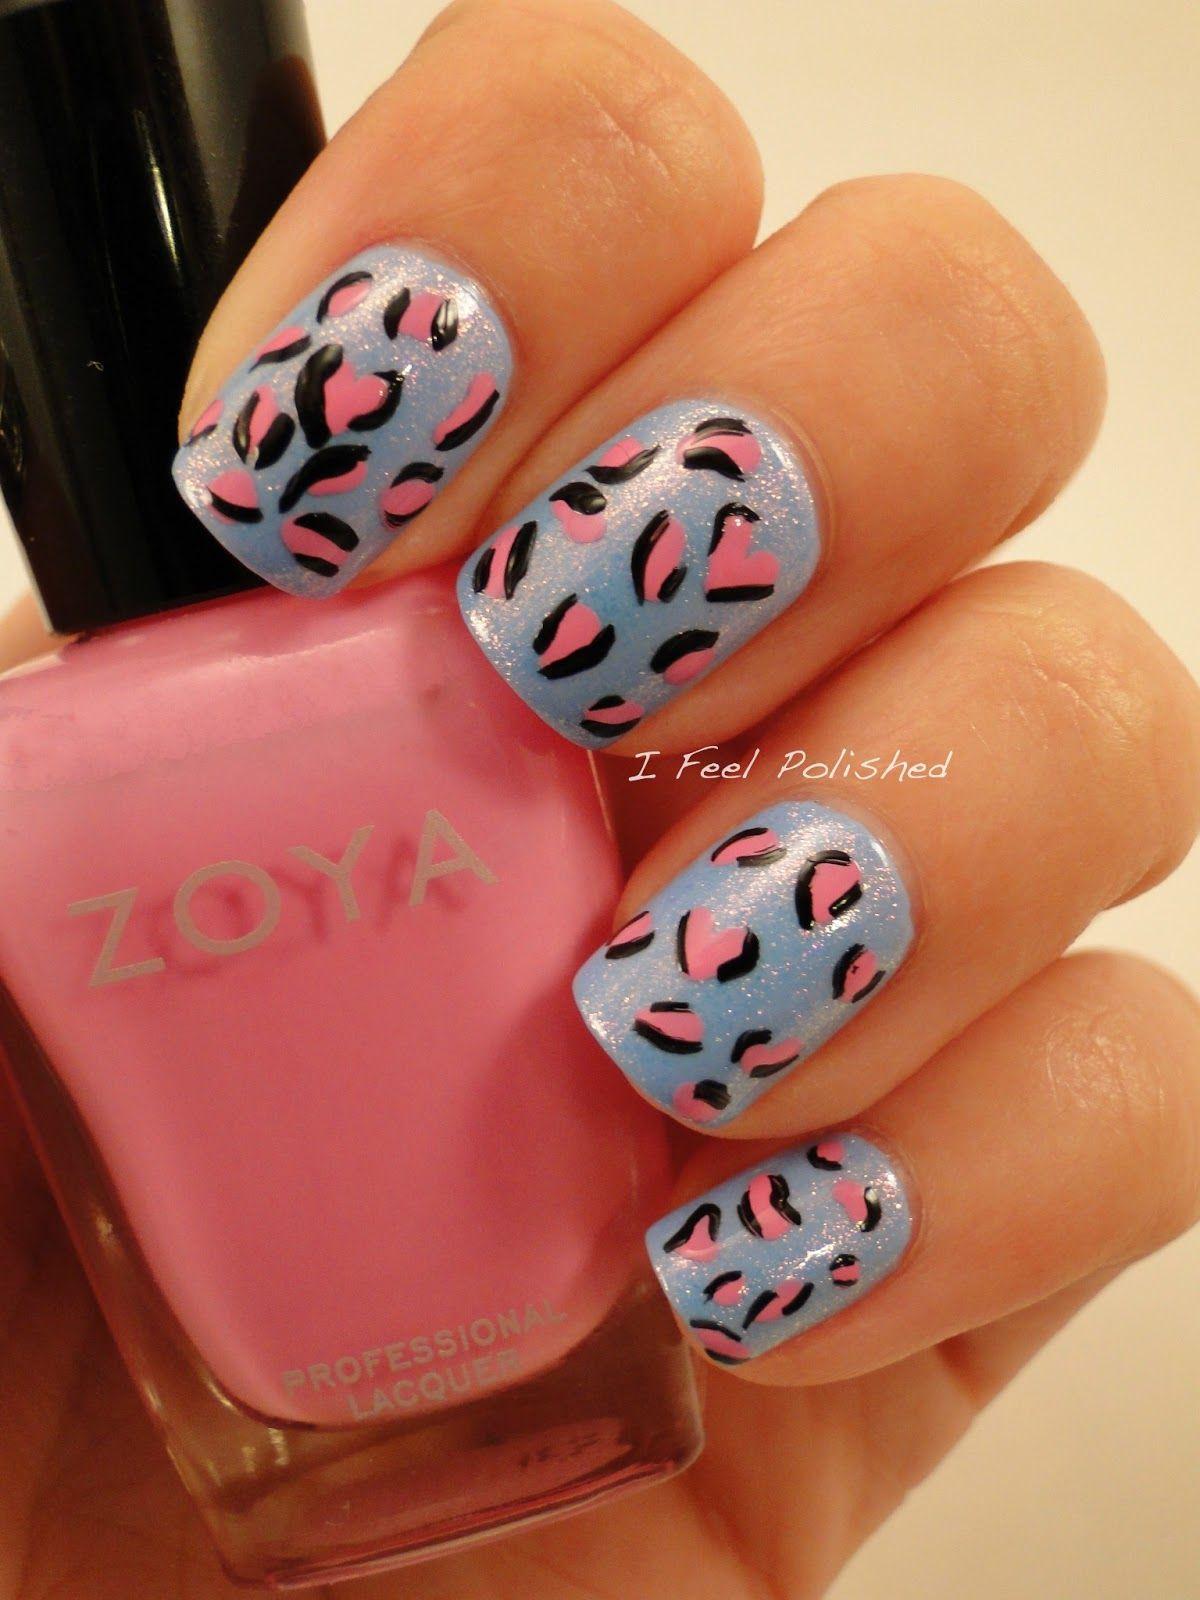 Leopard Print Nails | Nail Art Ideas | Pinterest | Leopardendruck ...